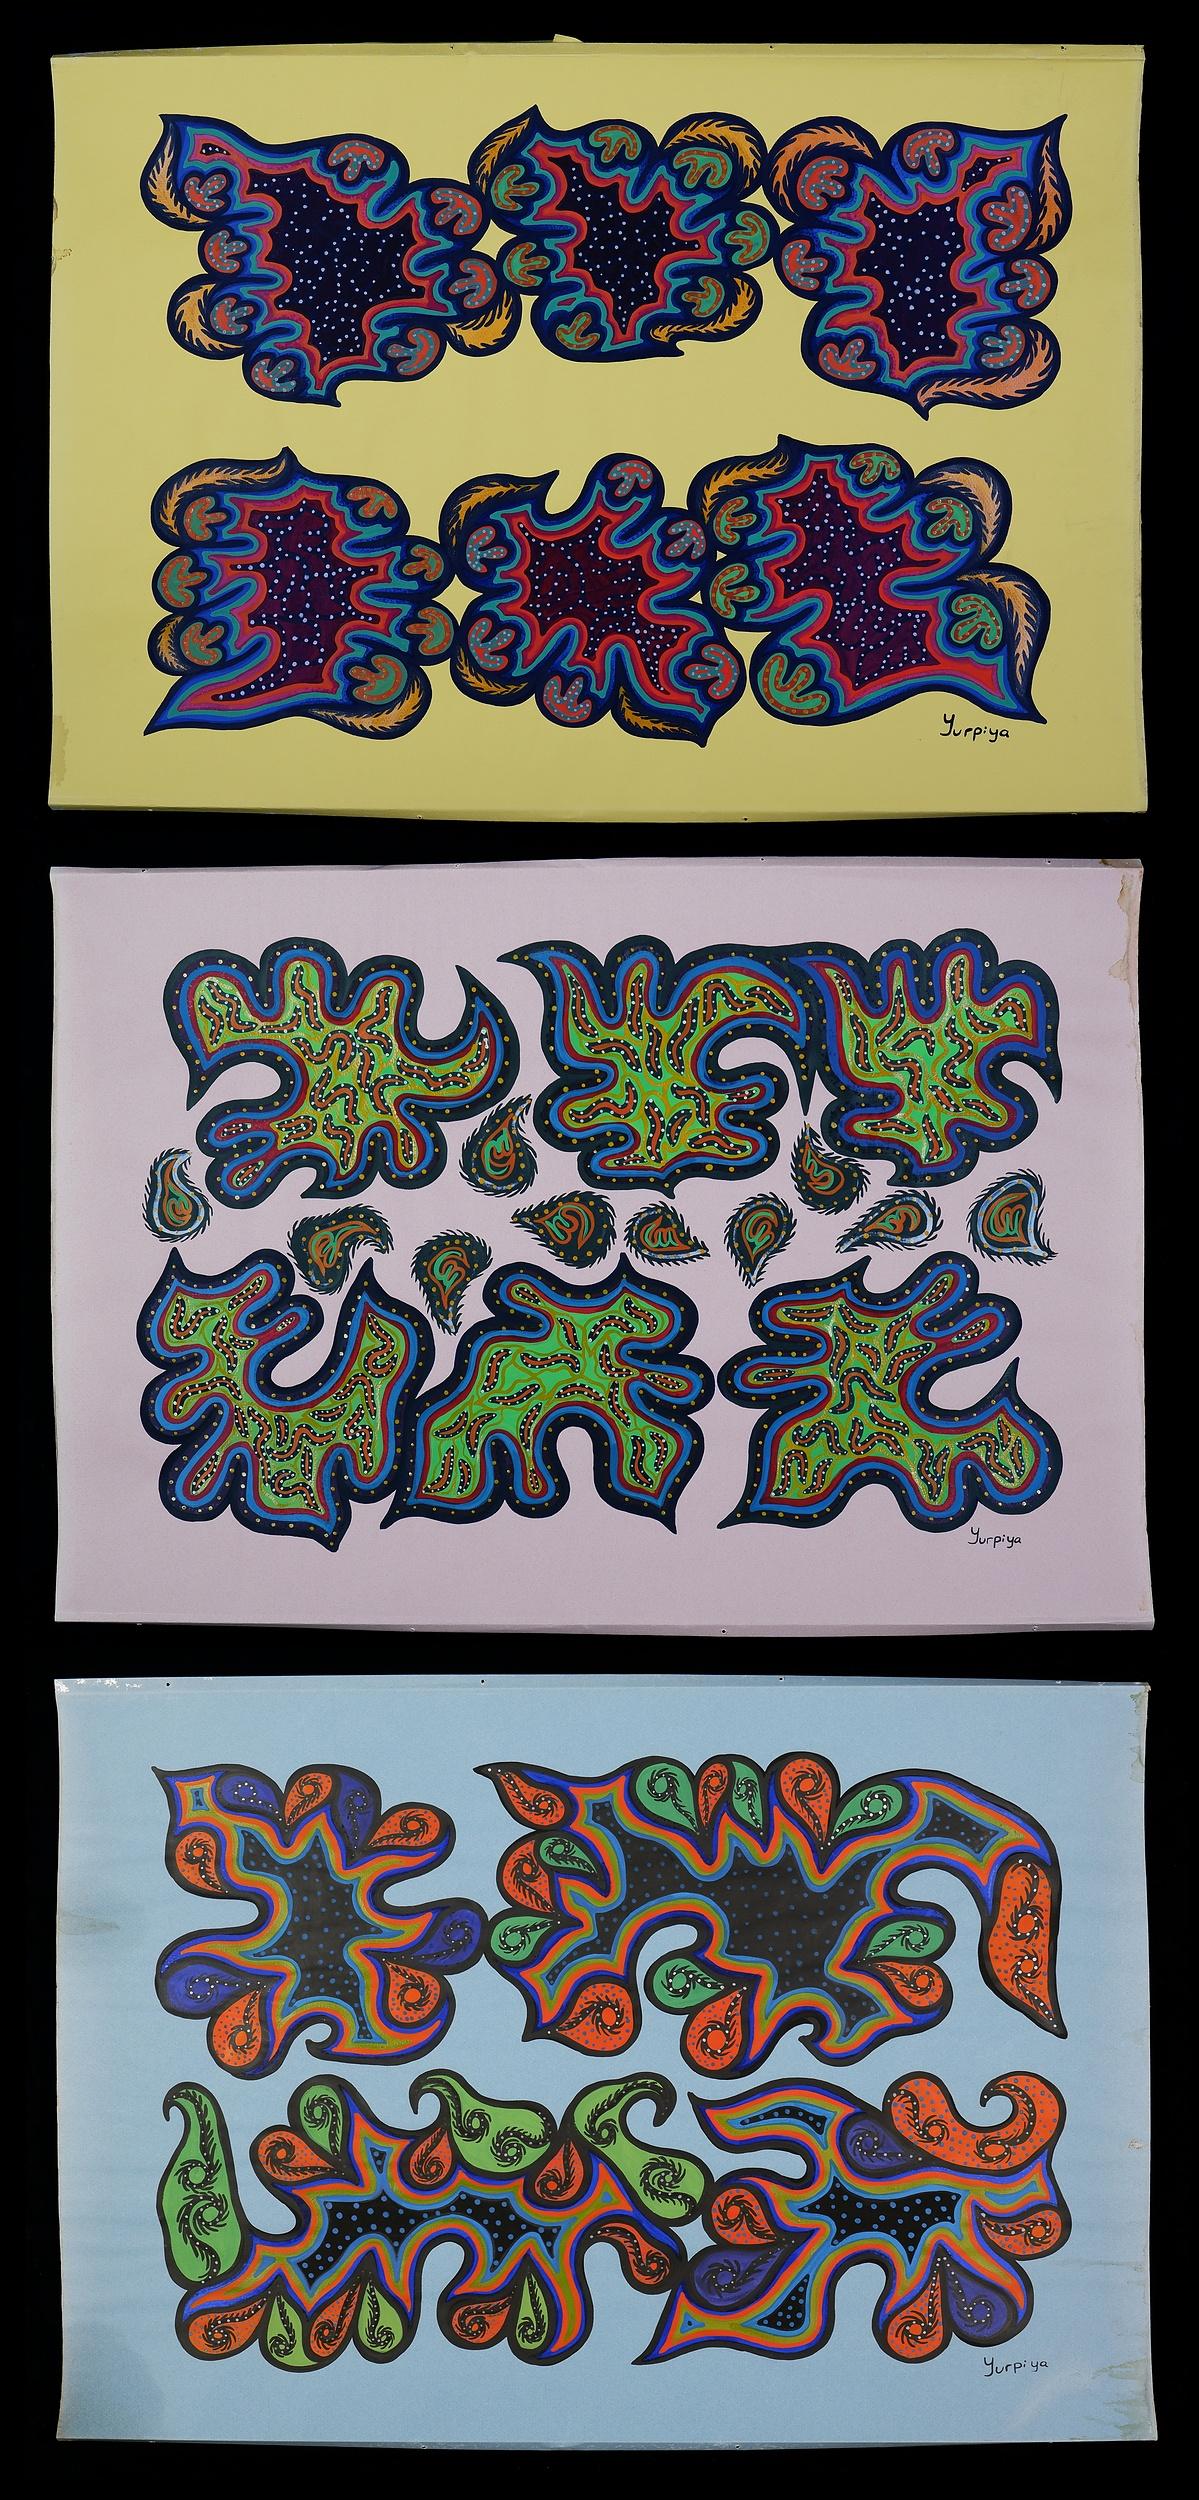 'Yurpiya Lionel (born 1960, Pitjantjatjara language group), Three Untitled Works, Gouache on Paper (3)'